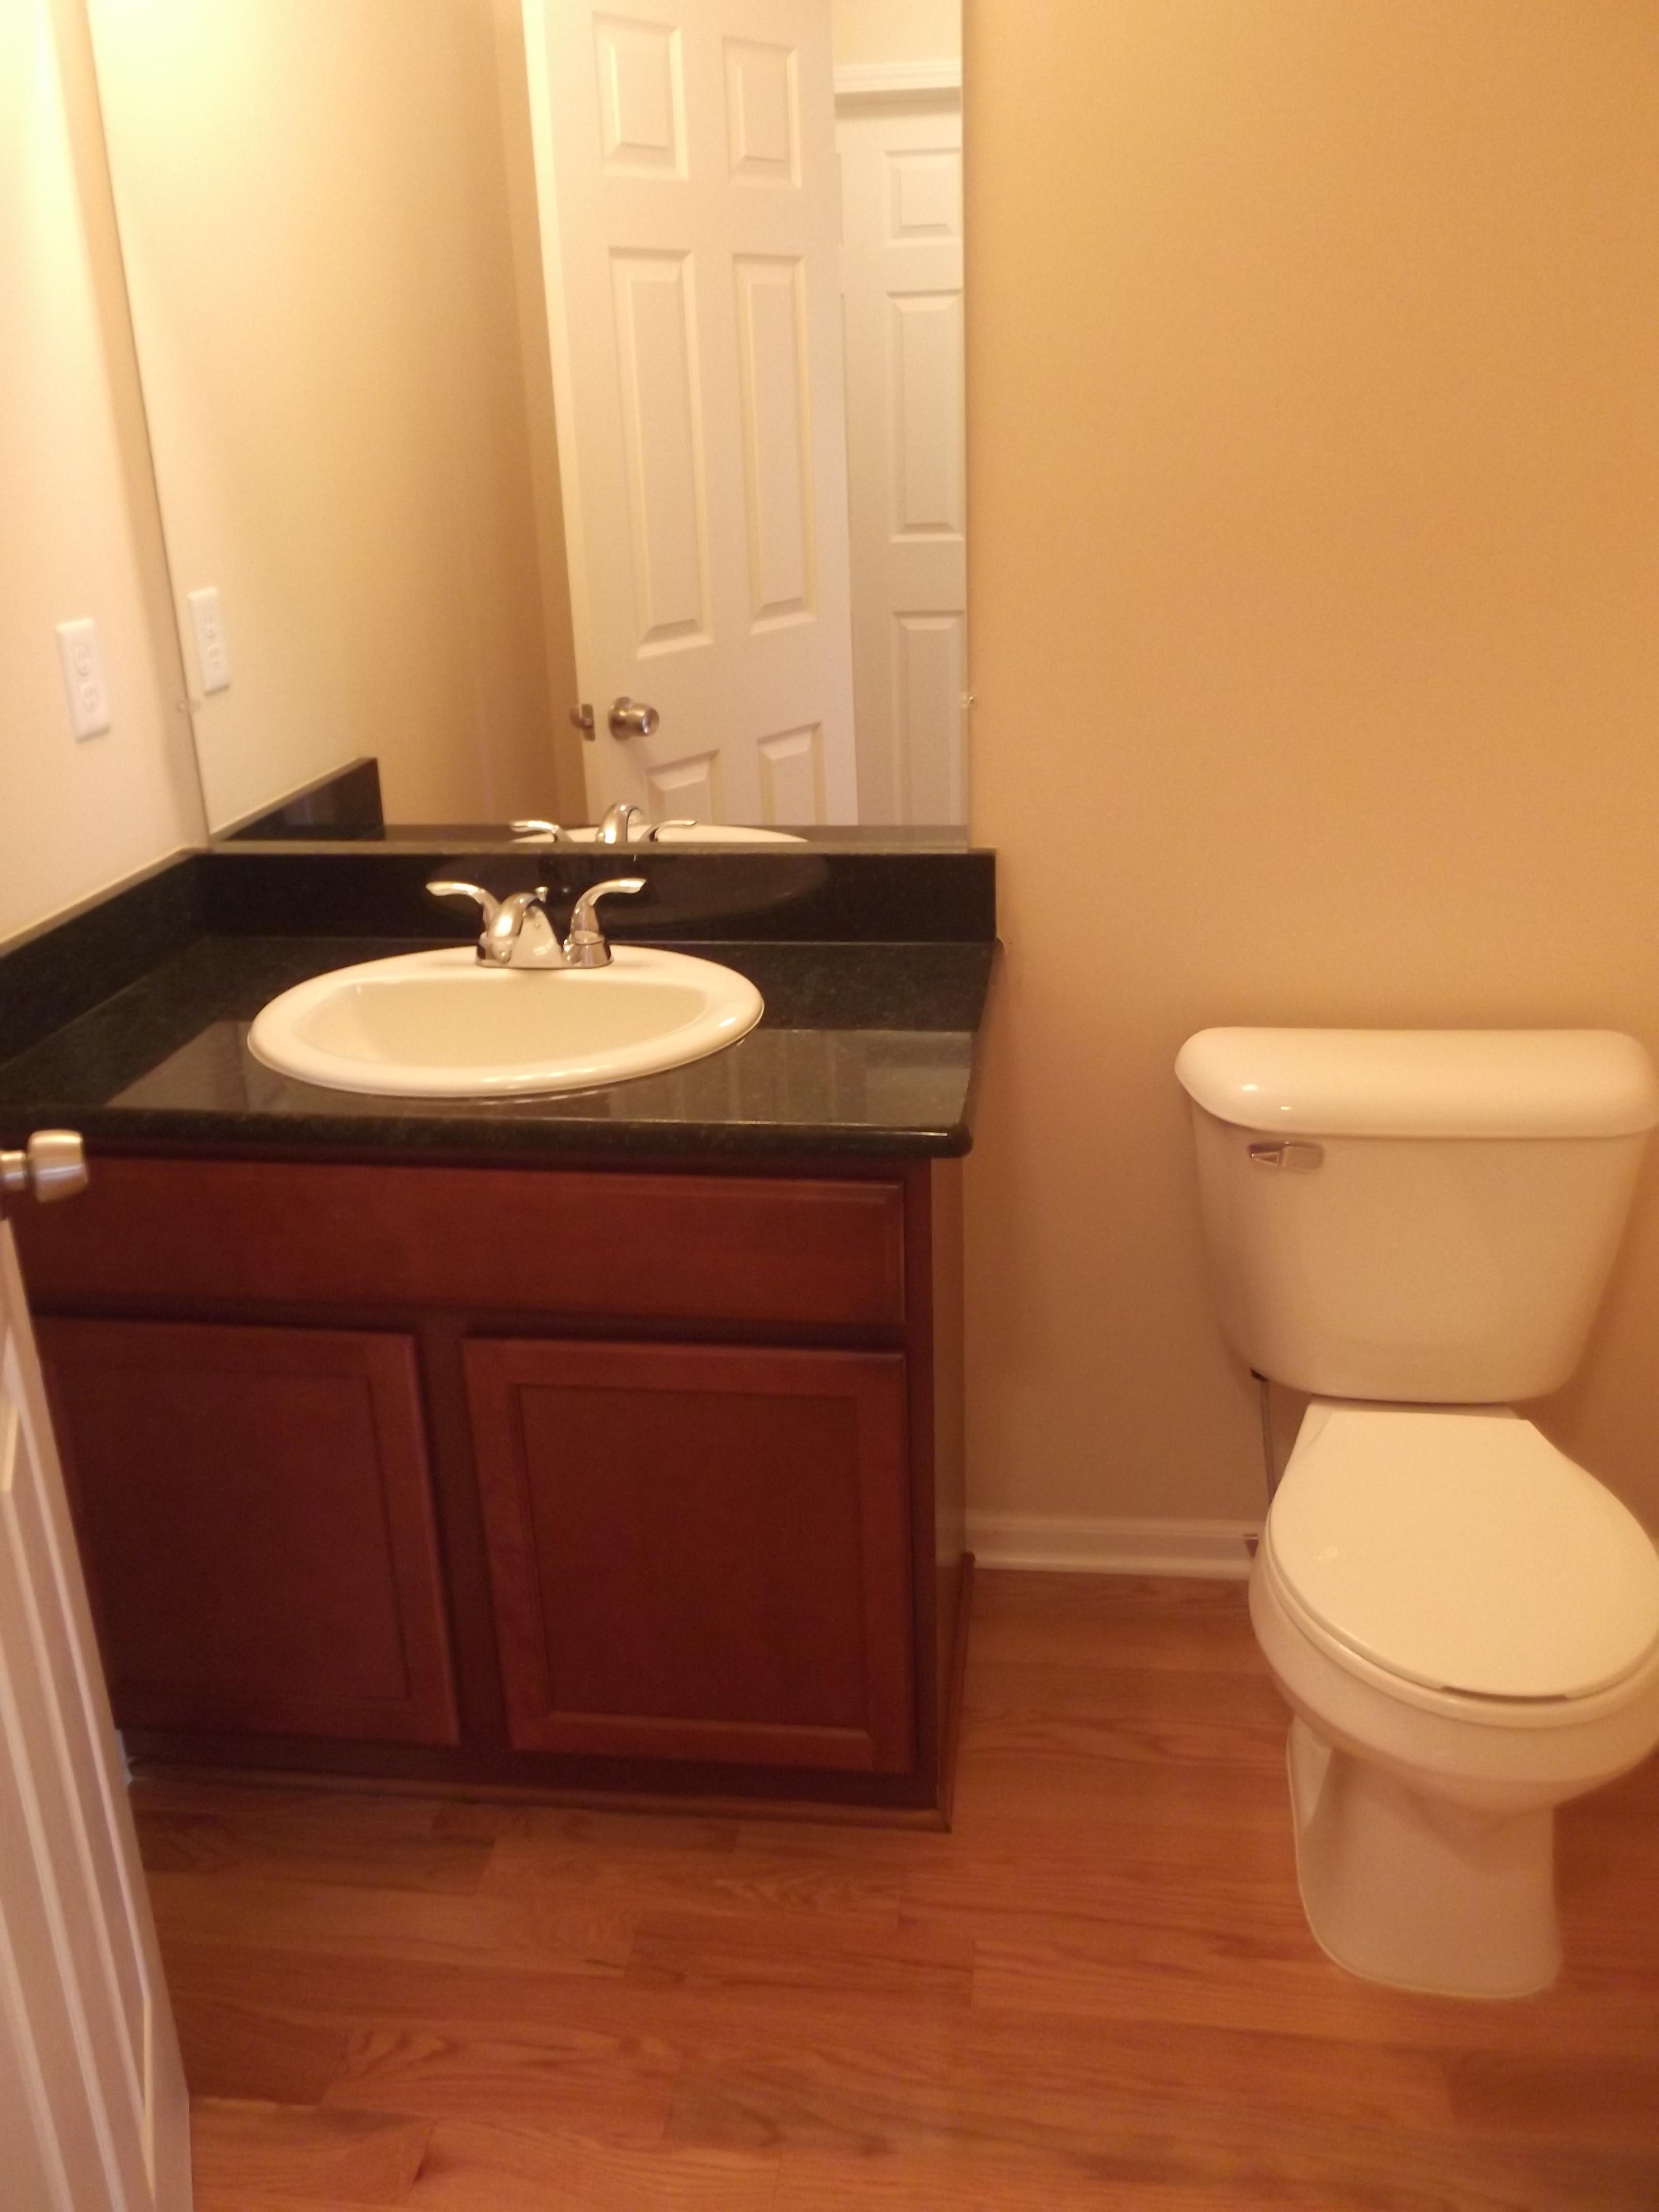 New Homes For Sale, Chestnut R. Powd